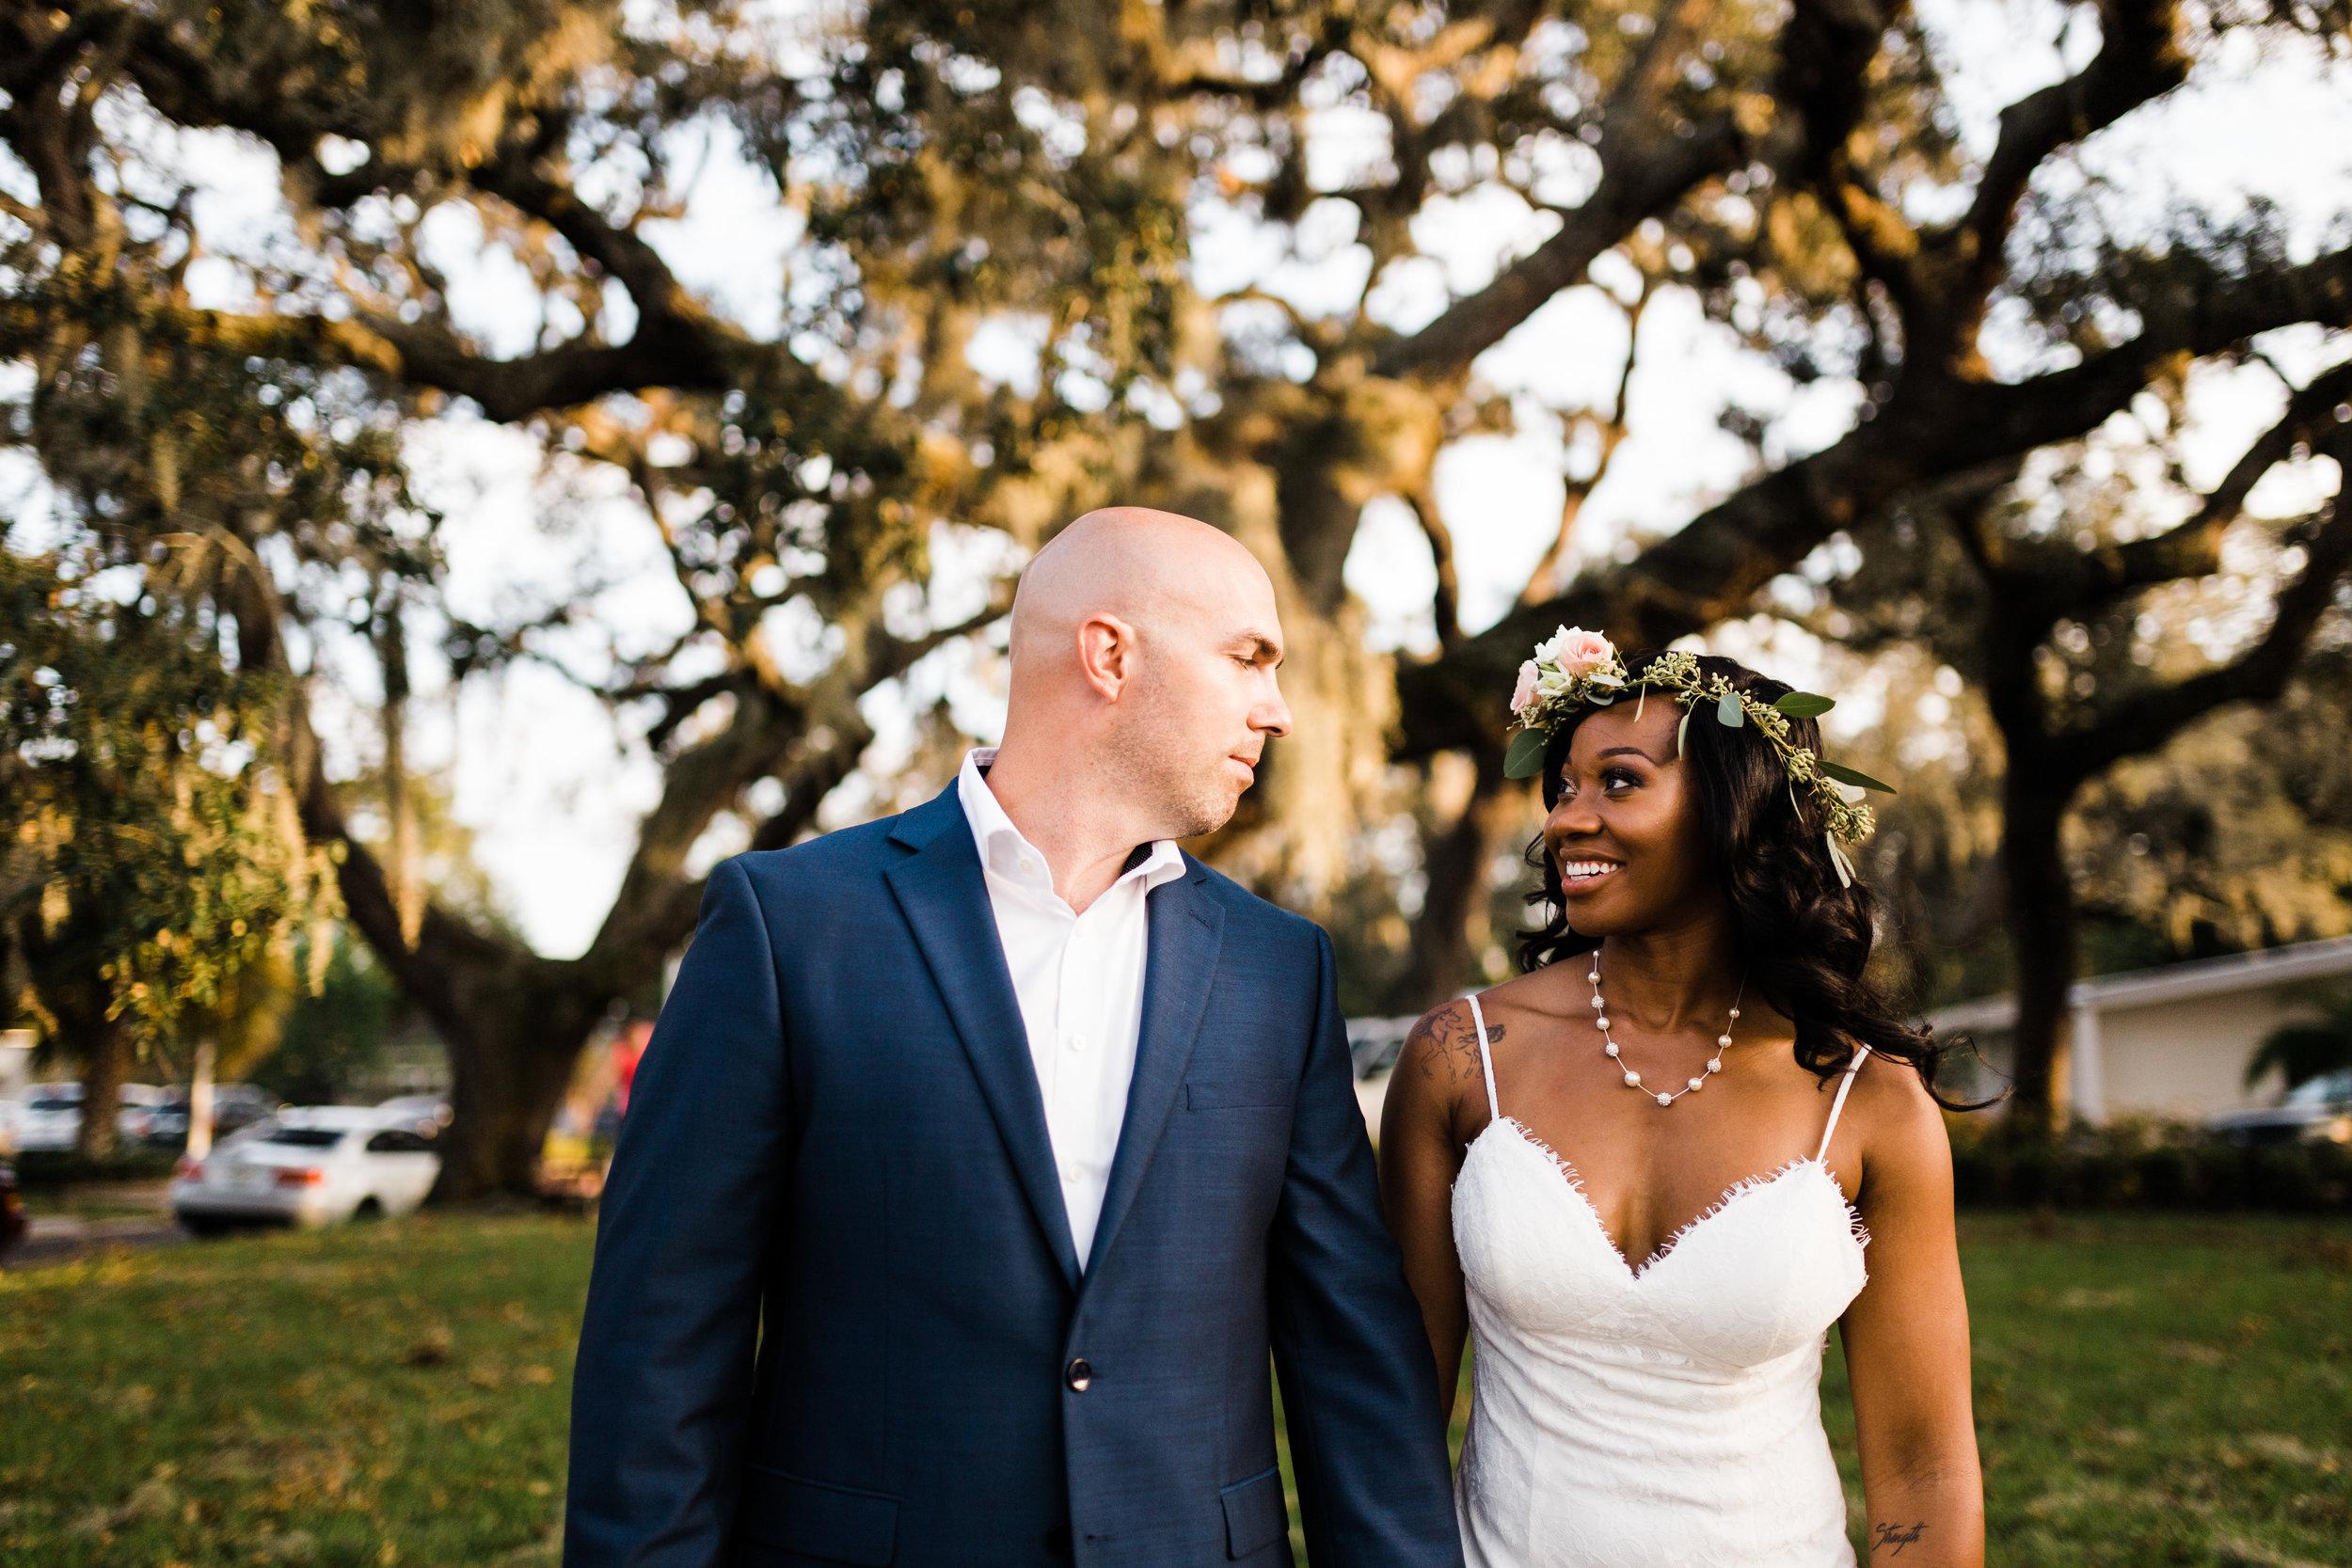 2017.09.16 Ashley and Chuck O'Day Quantam Leap Winery Wedding (400 of 462).jpg